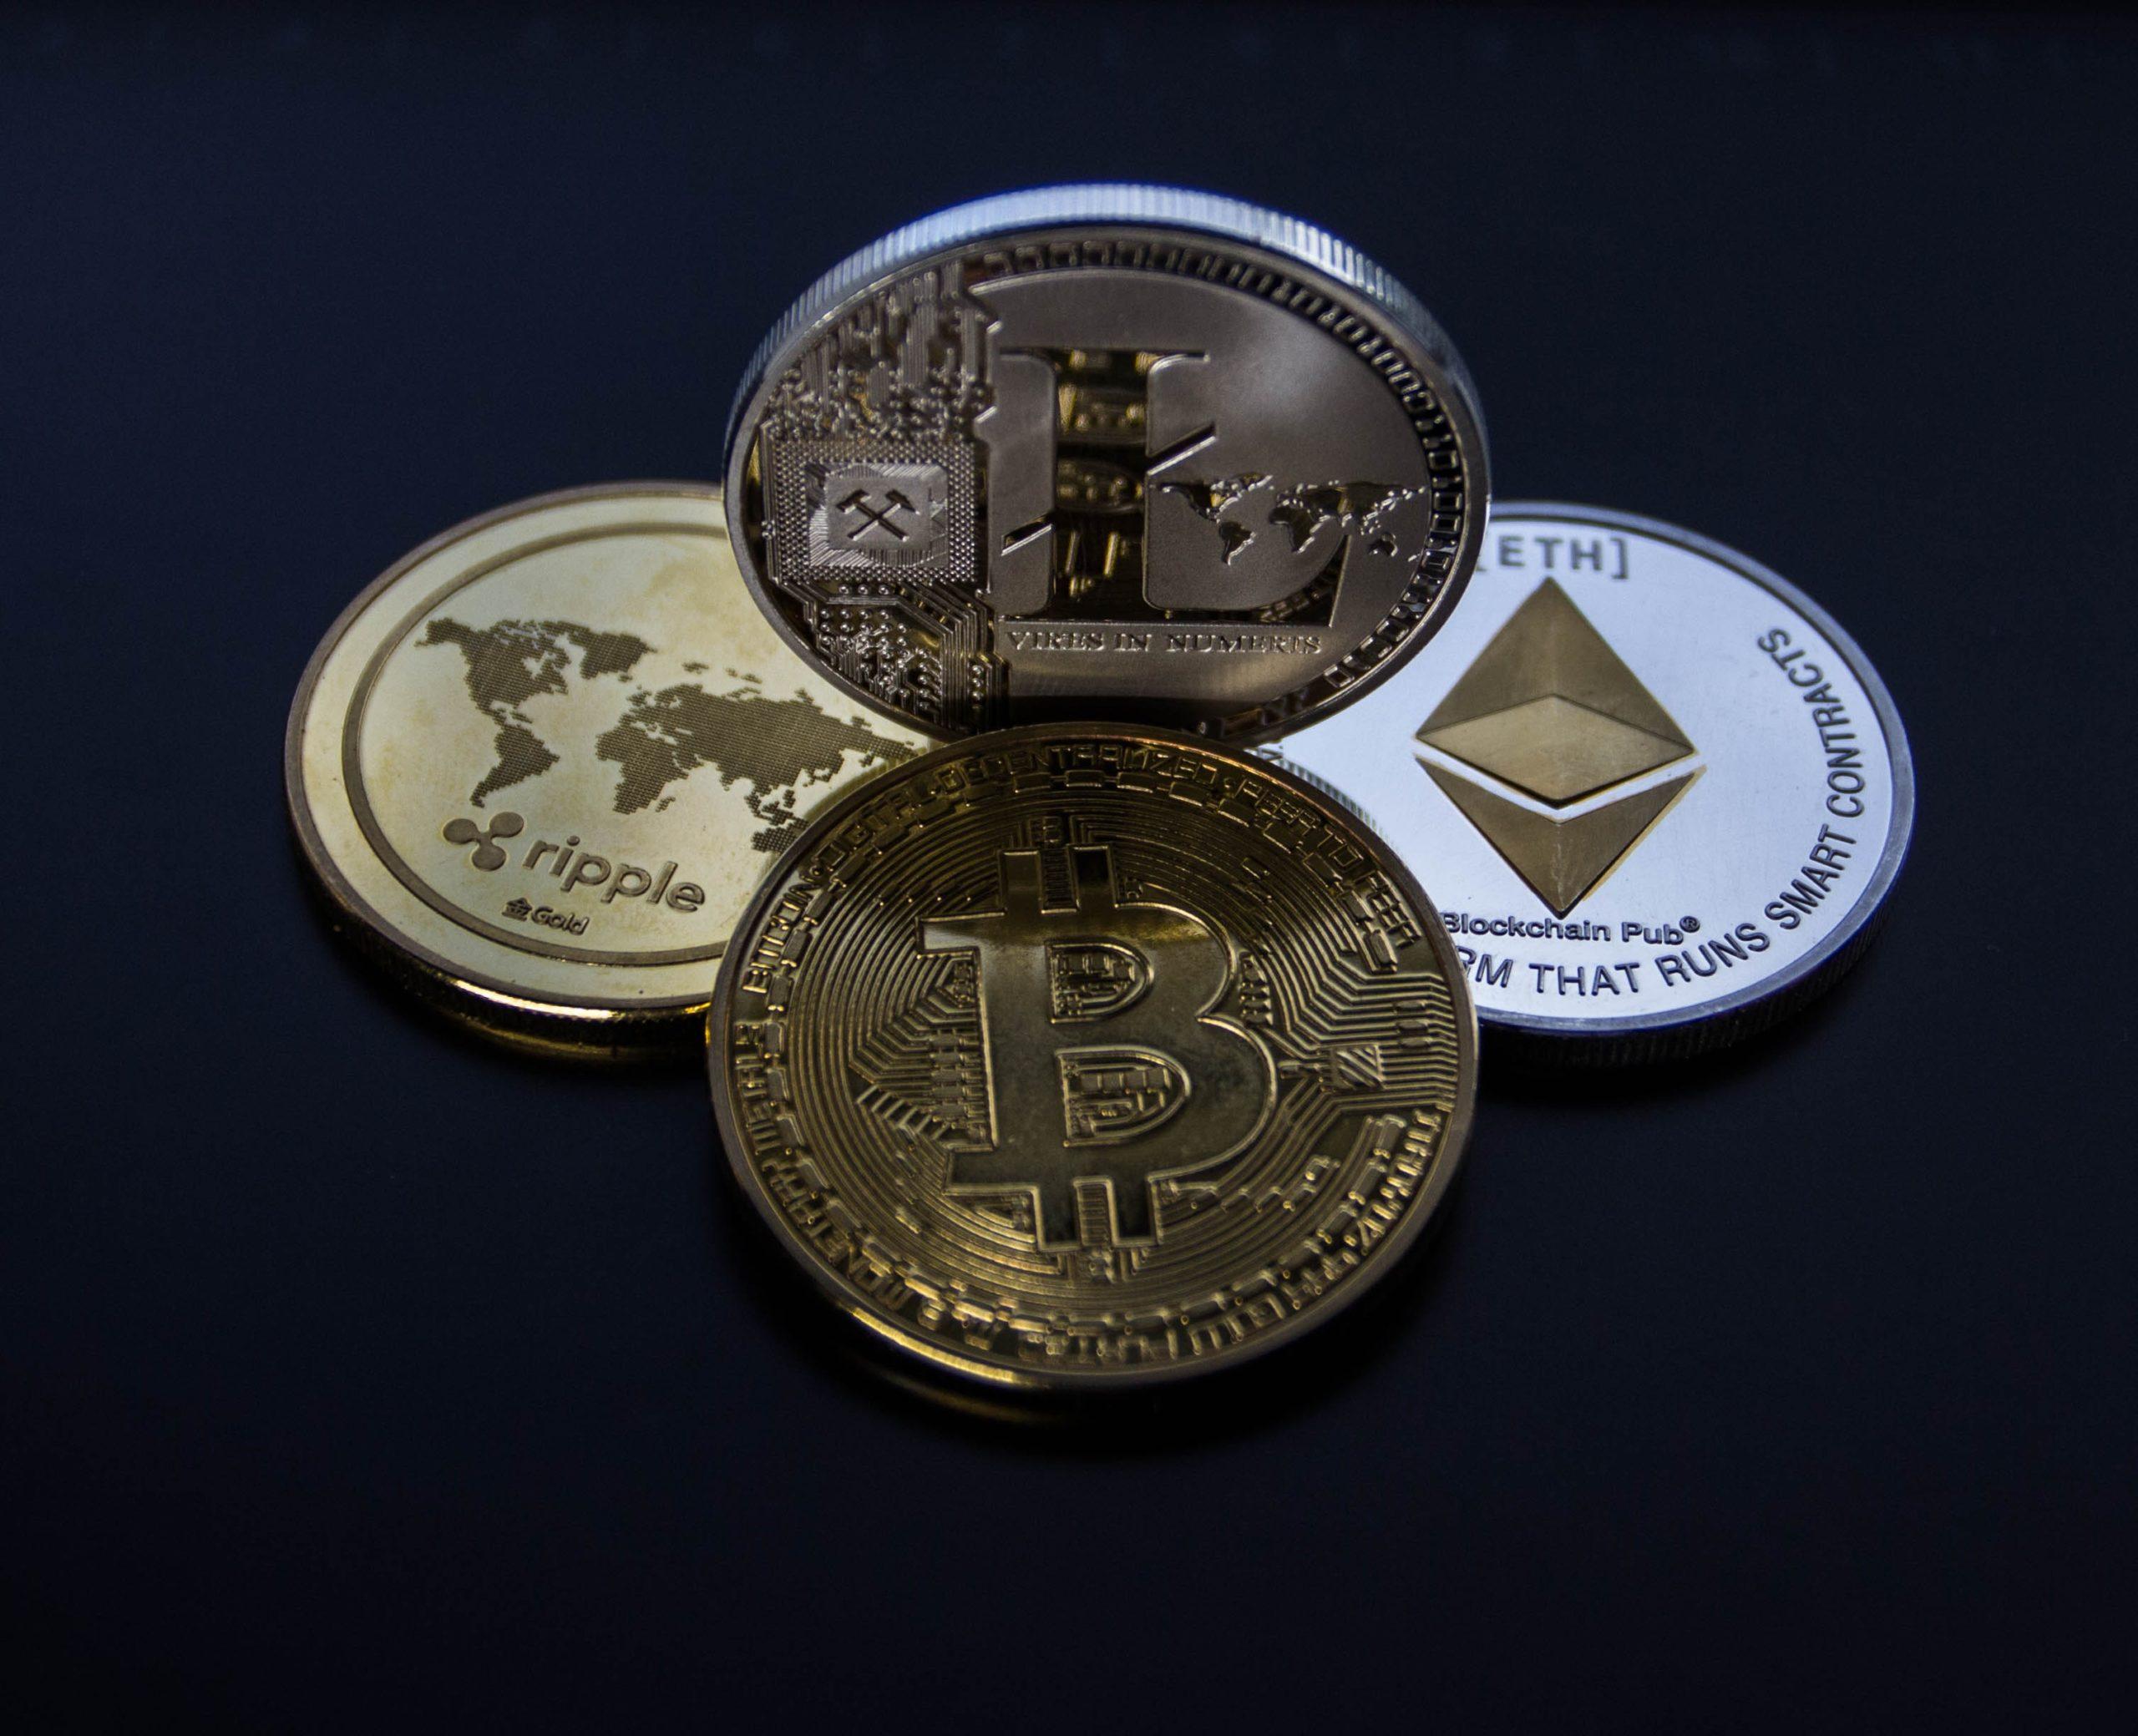 Crypto-Coins, Ethereum, Bitcoin, ICO, Blockchain, Idunatek-ERC20-Coin by Idunatek Software-Entwicklung